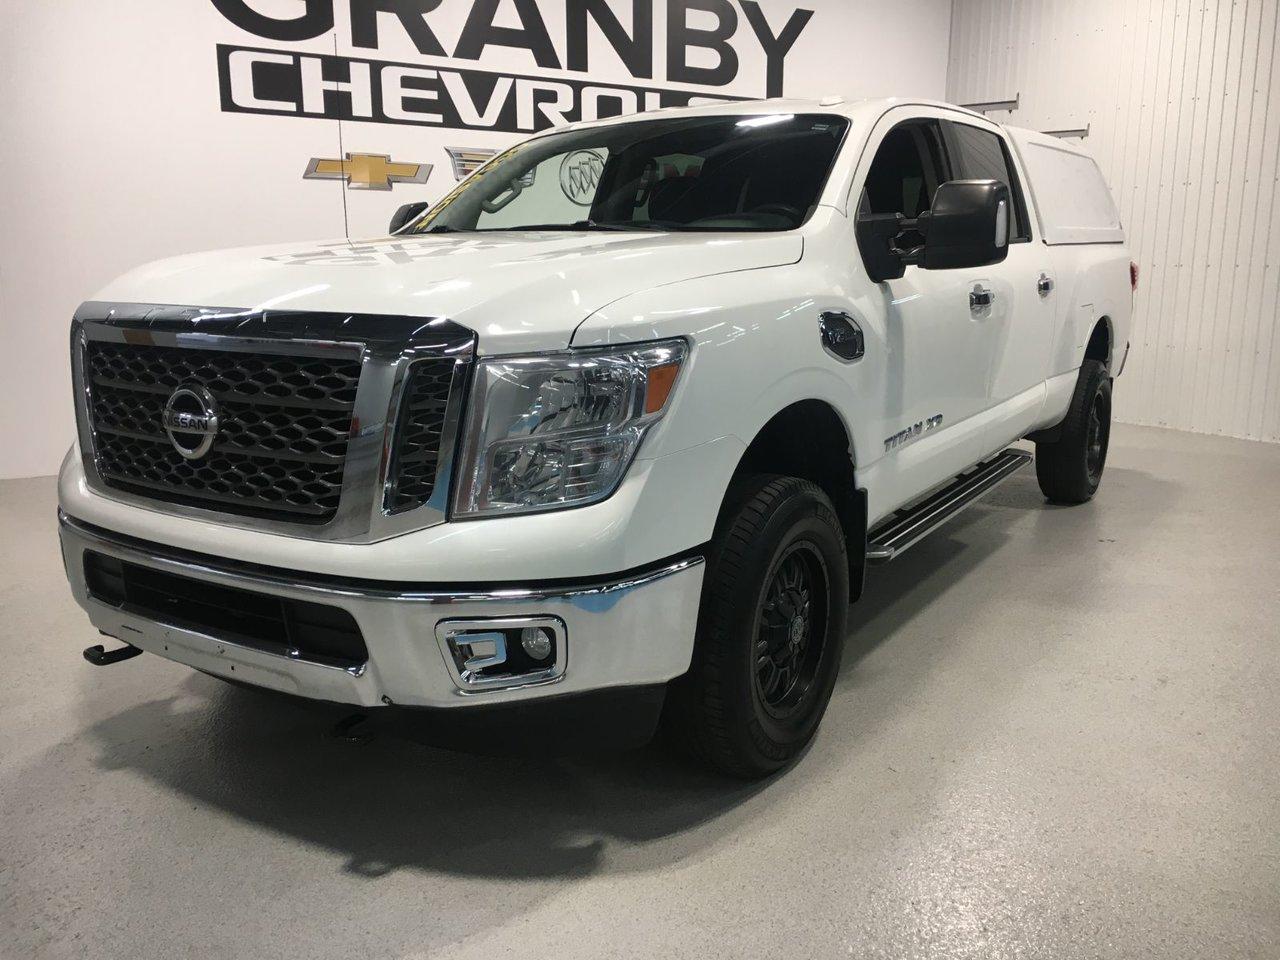 Nissan Titan XD 2017 S